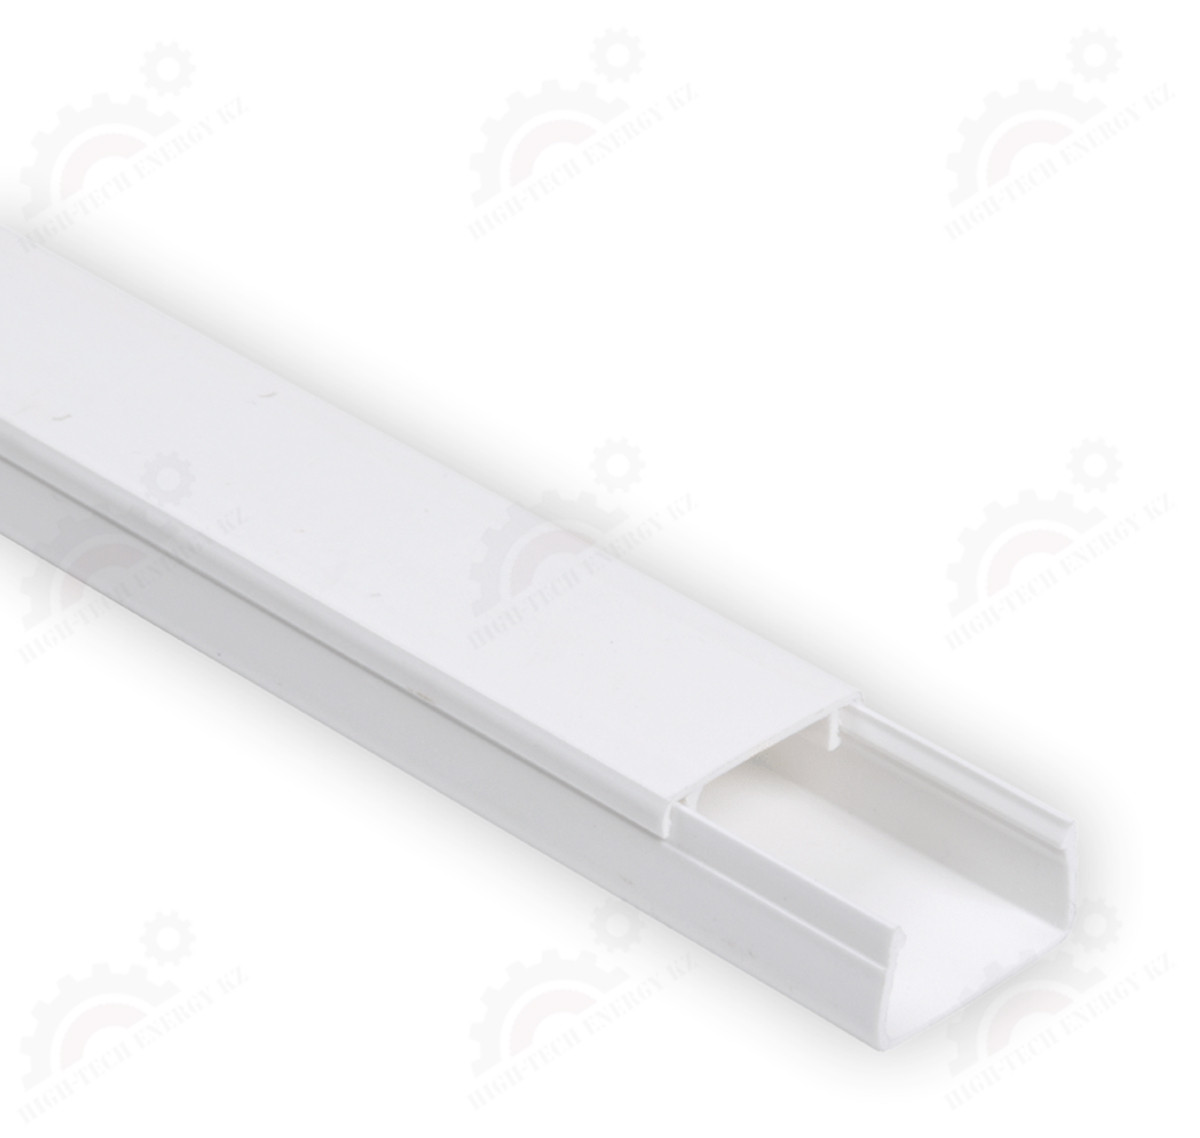 Кабельный канал 15*10 мм